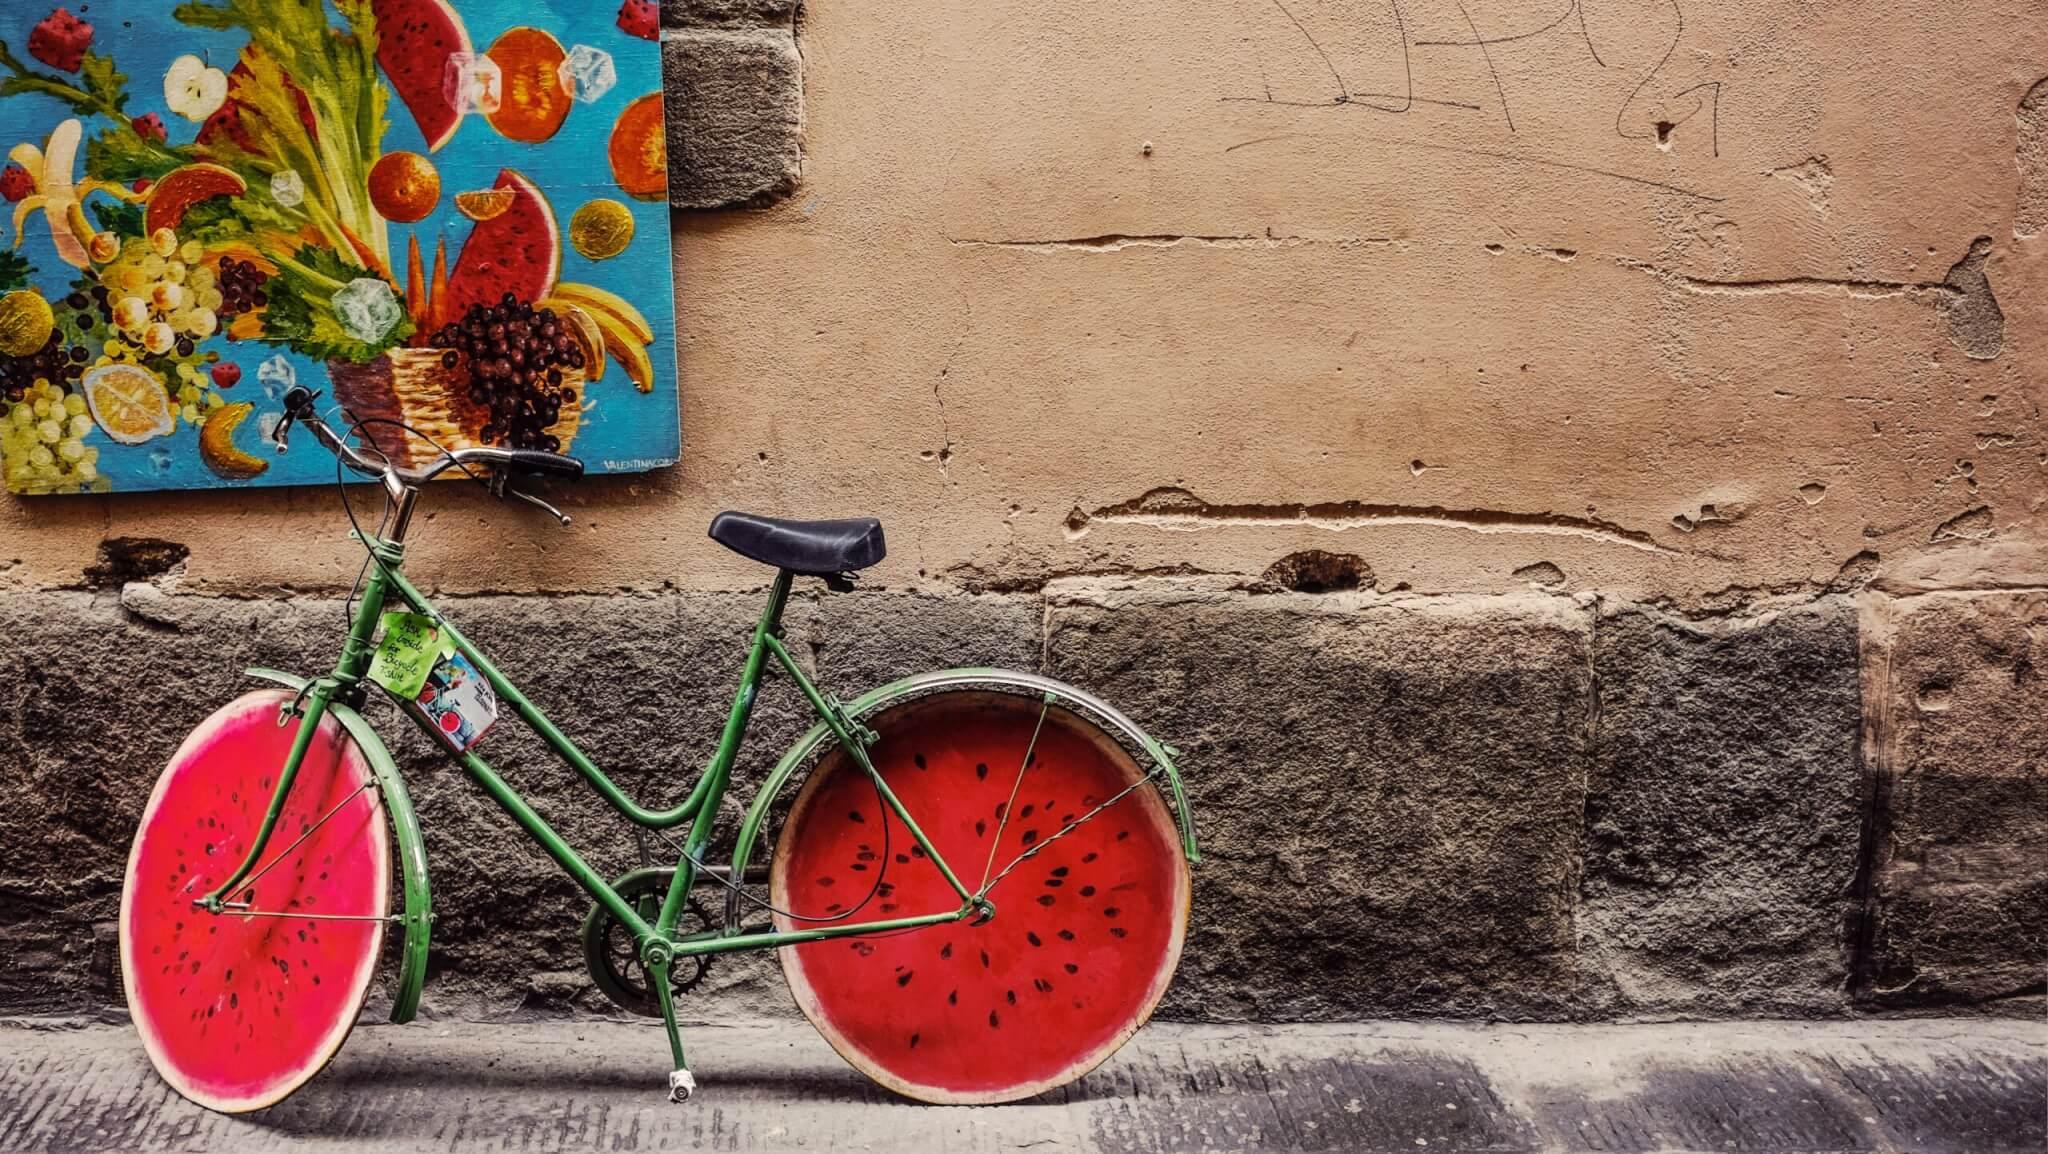 biking outdoor